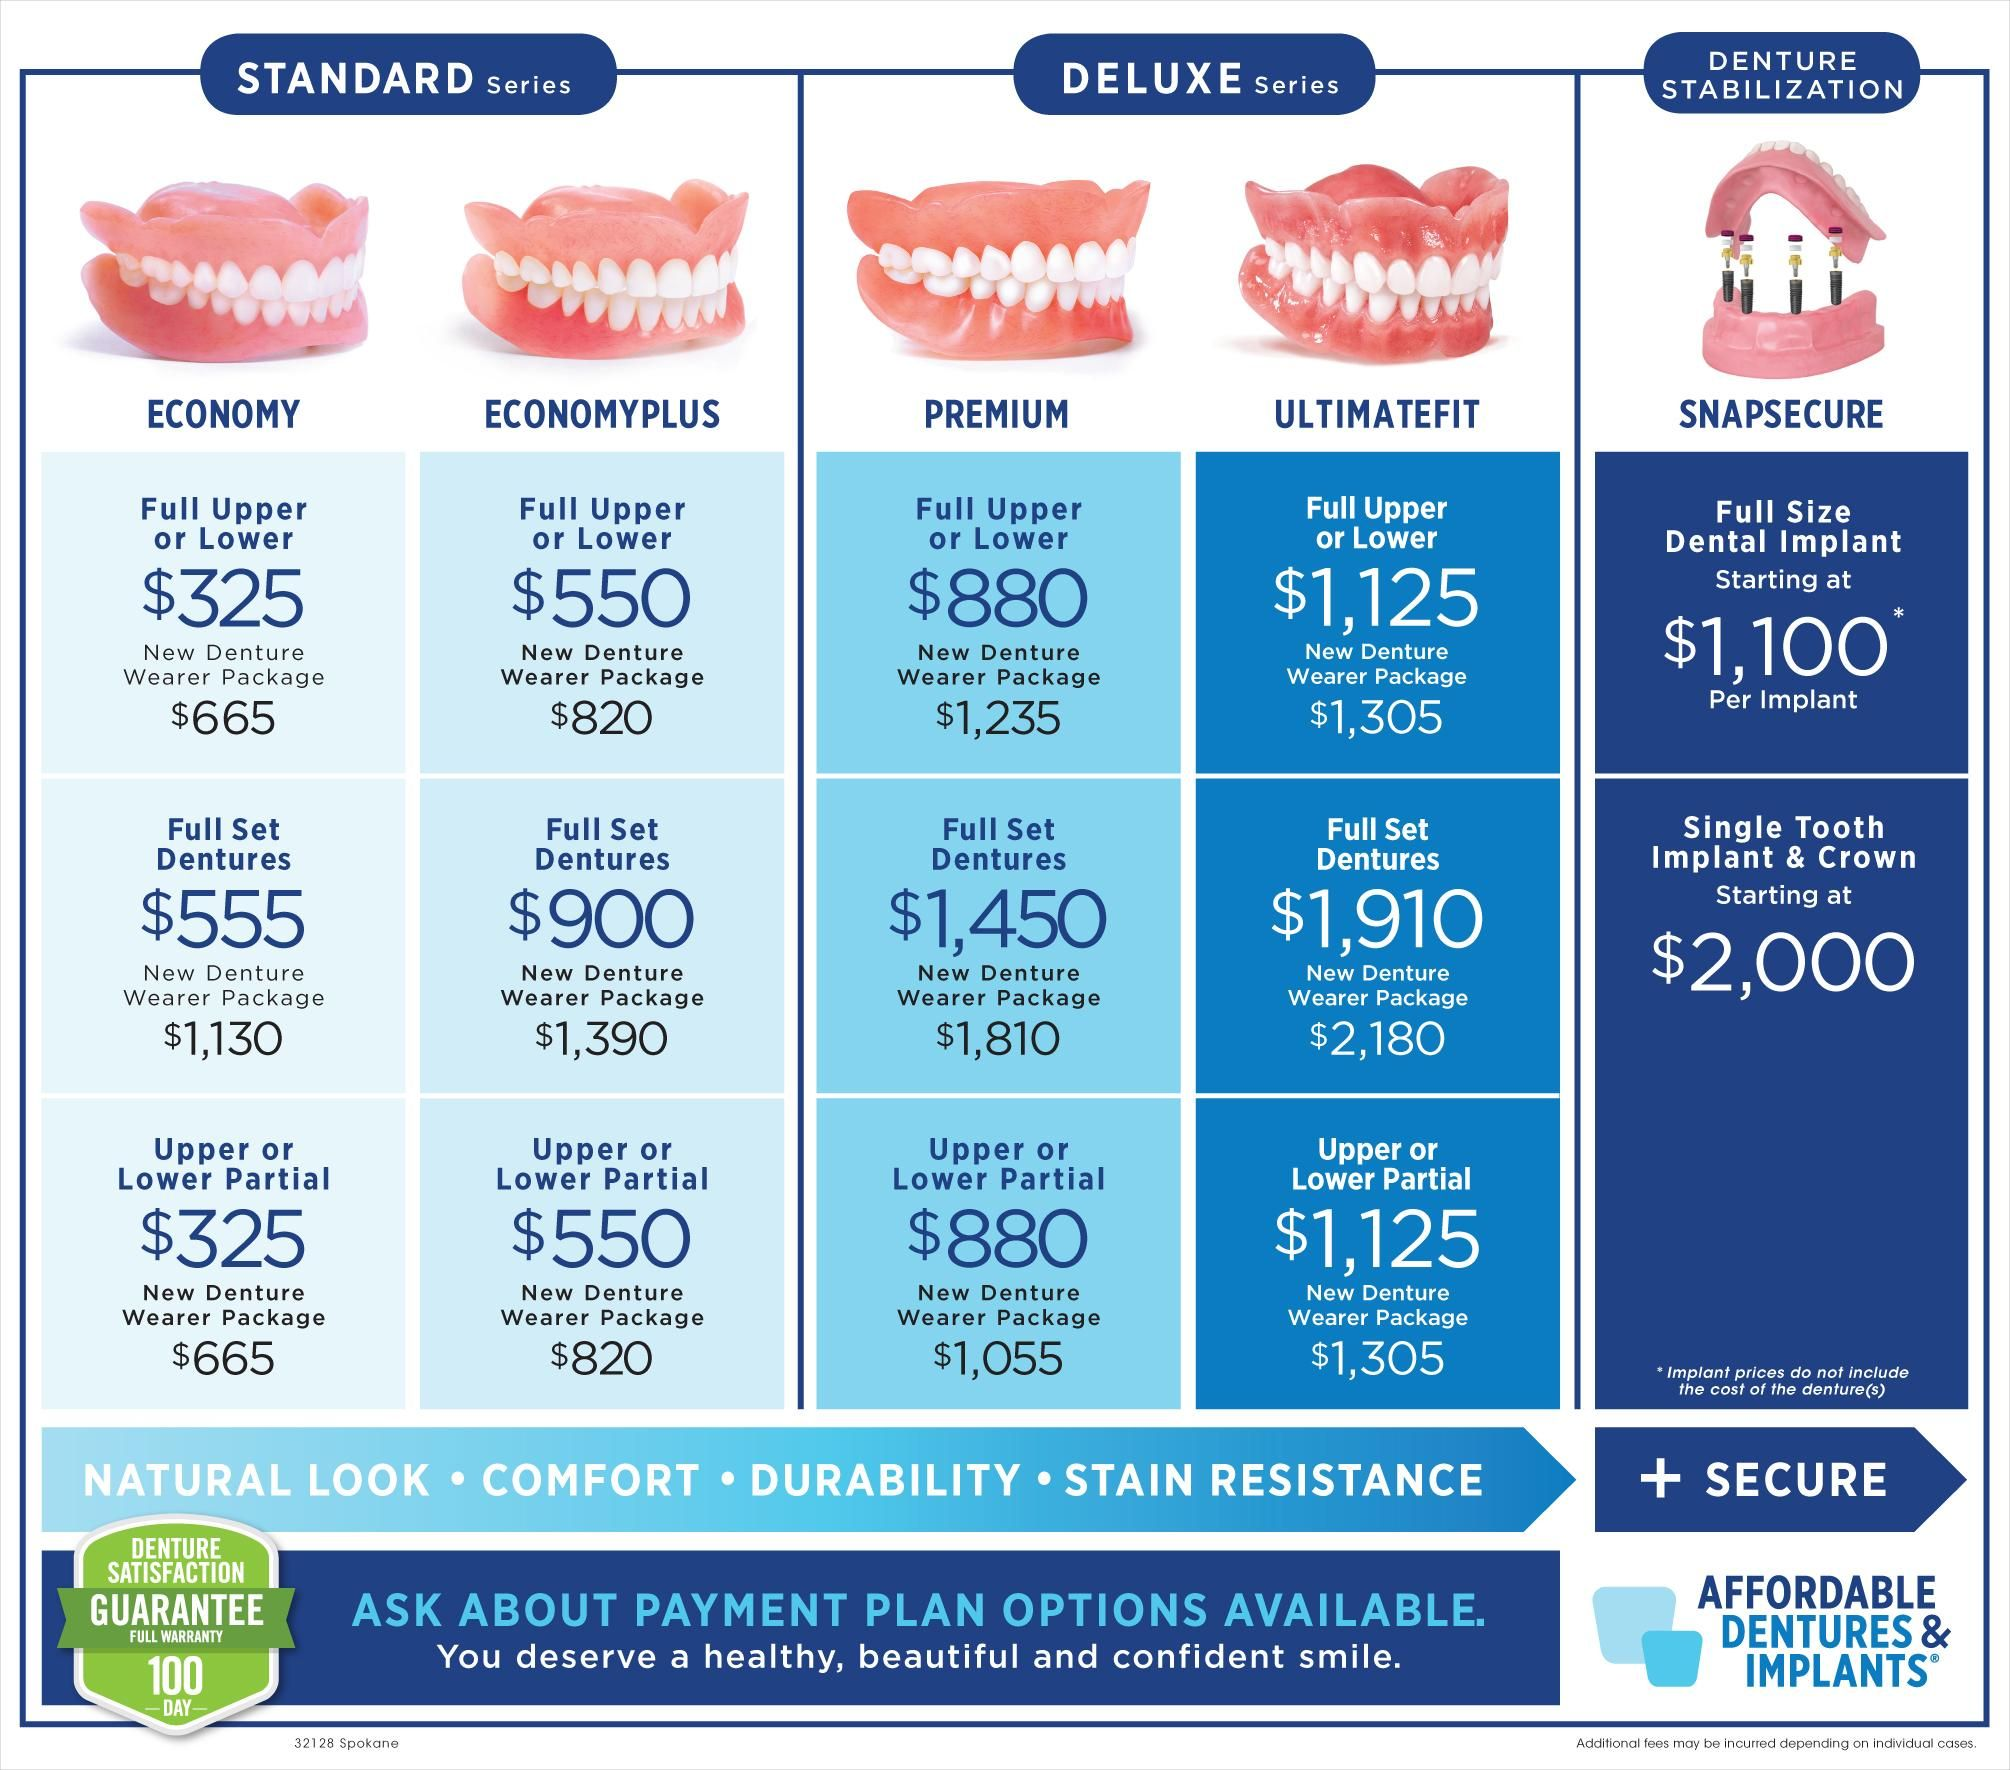 Dentures dentist dental implants spokane valley